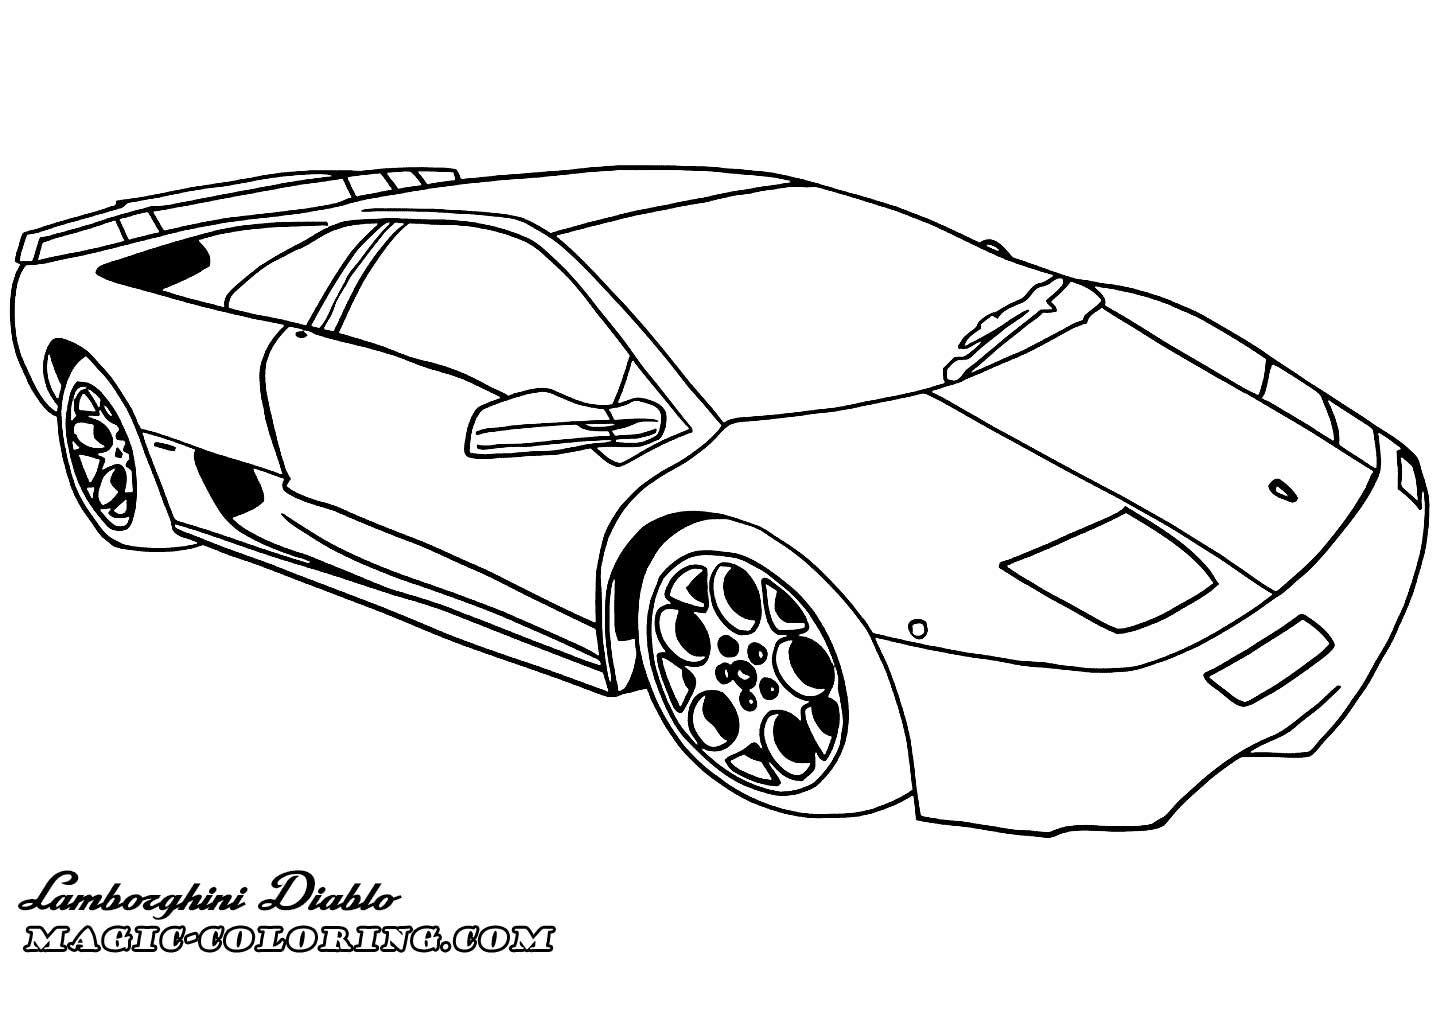 Lamborghini Diablo Coloring Page Cars Coloring Pages Lamborghini Coloring Pages